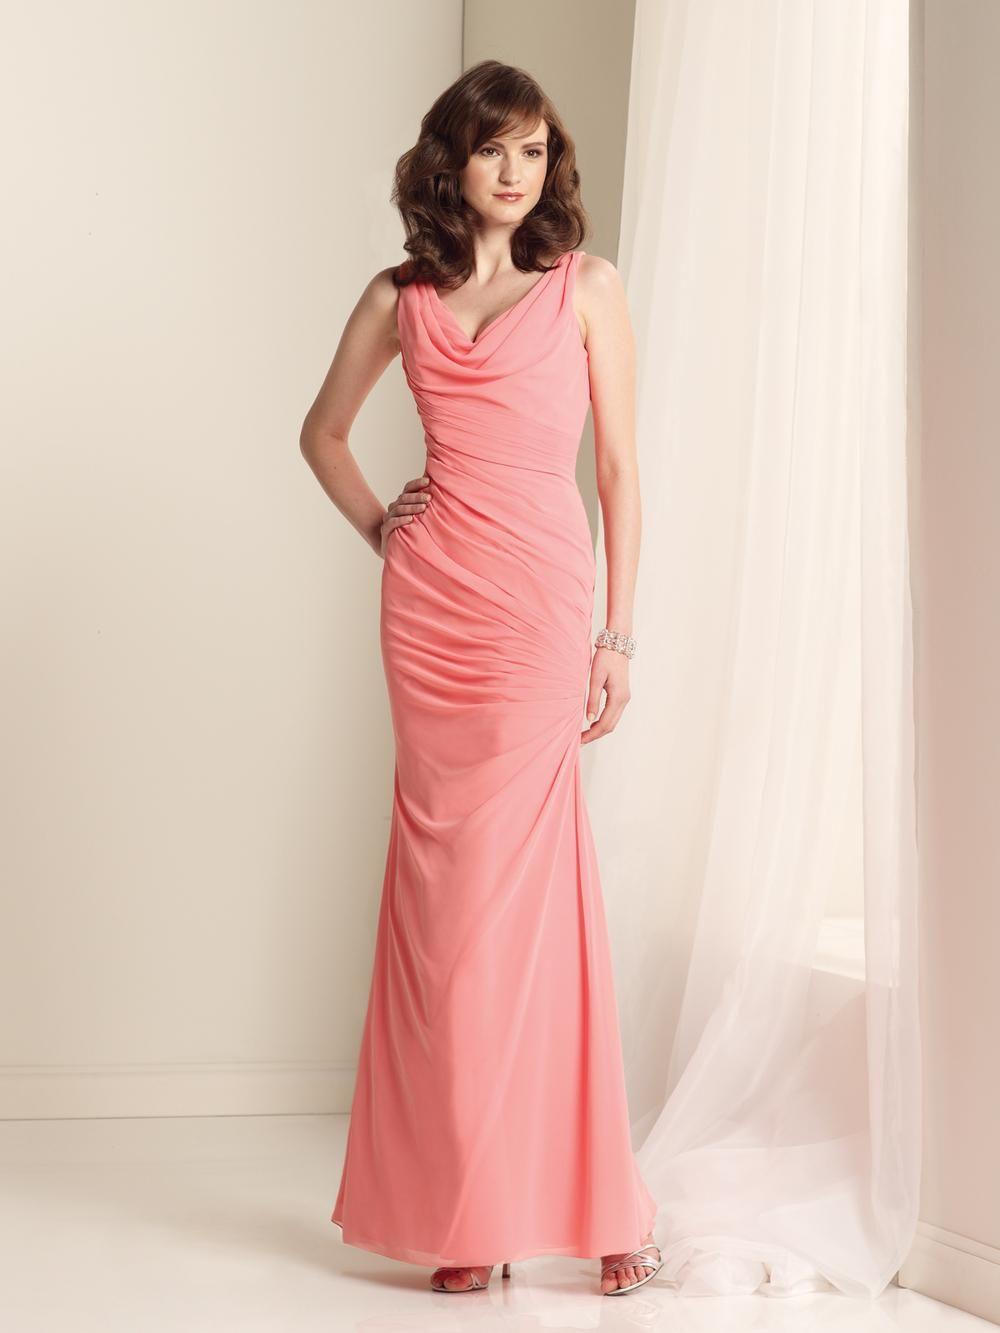 Elegant-Chiffon-Coral-Bridesmaid-Dresses-Floor-Length-Sheath ... e1cee9d5a1a7